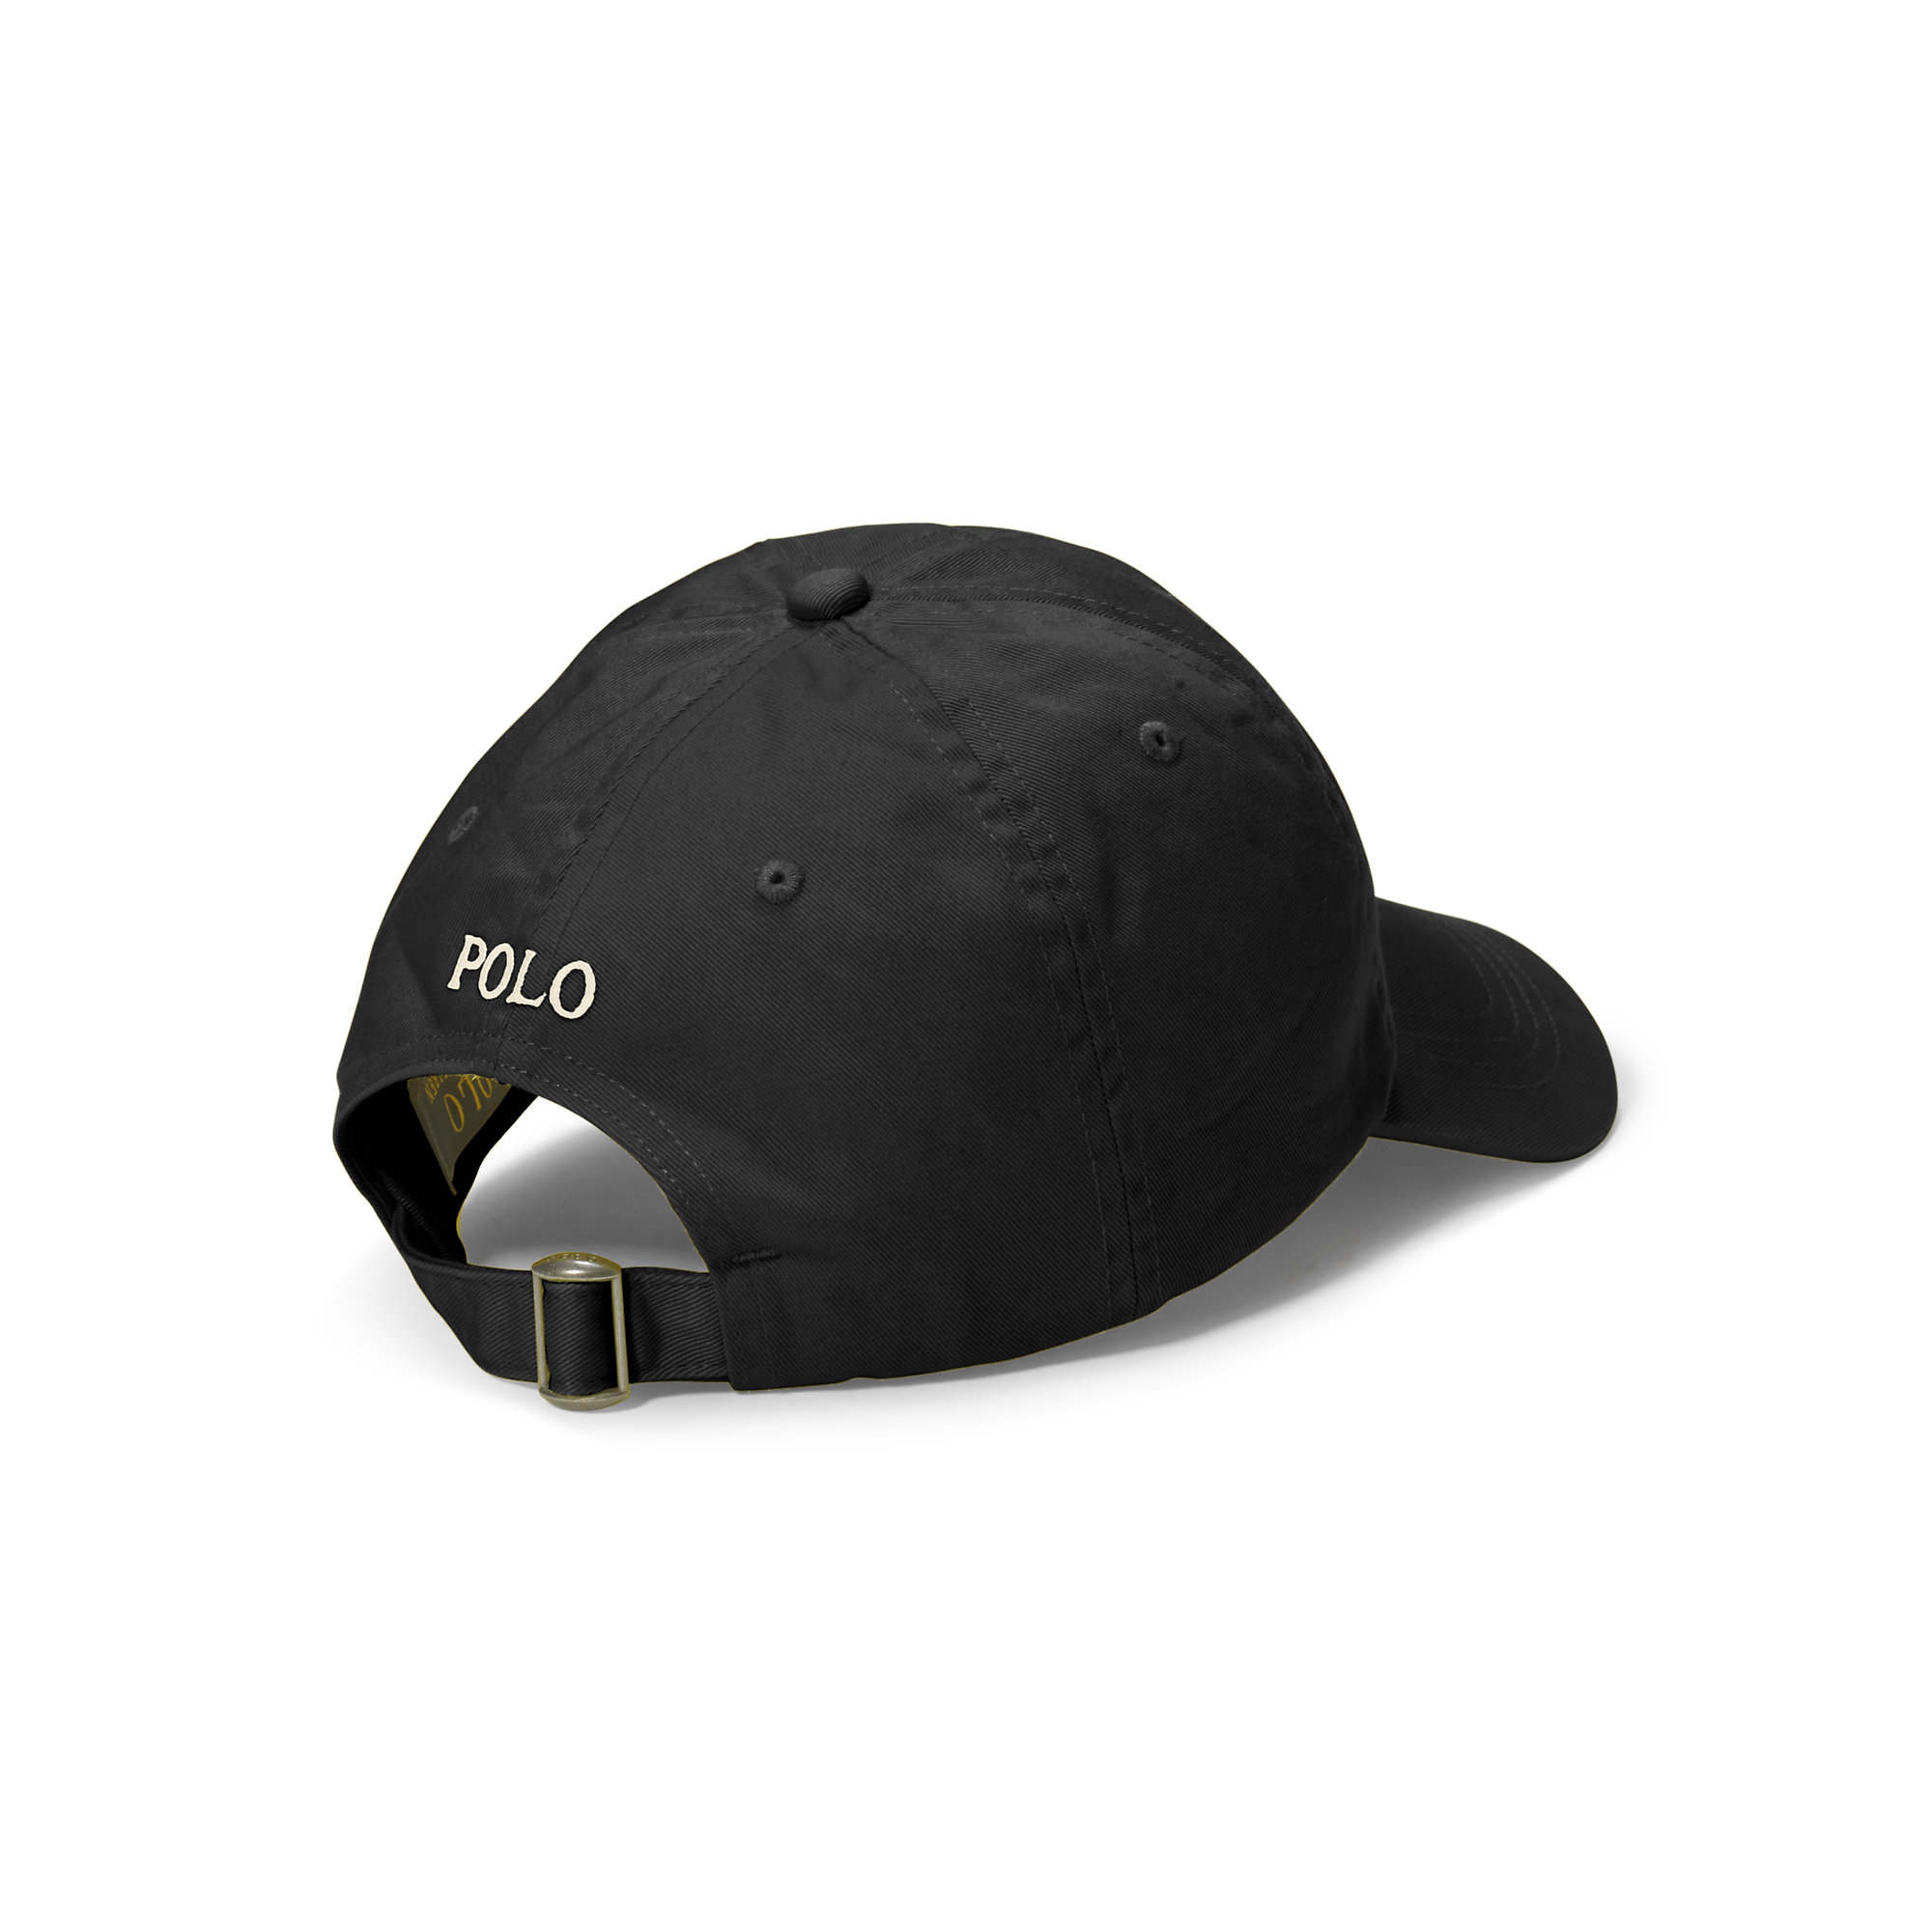 polo ralph lauren polo script chino baseball cap in black for men lyst. Black Bedroom Furniture Sets. Home Design Ideas